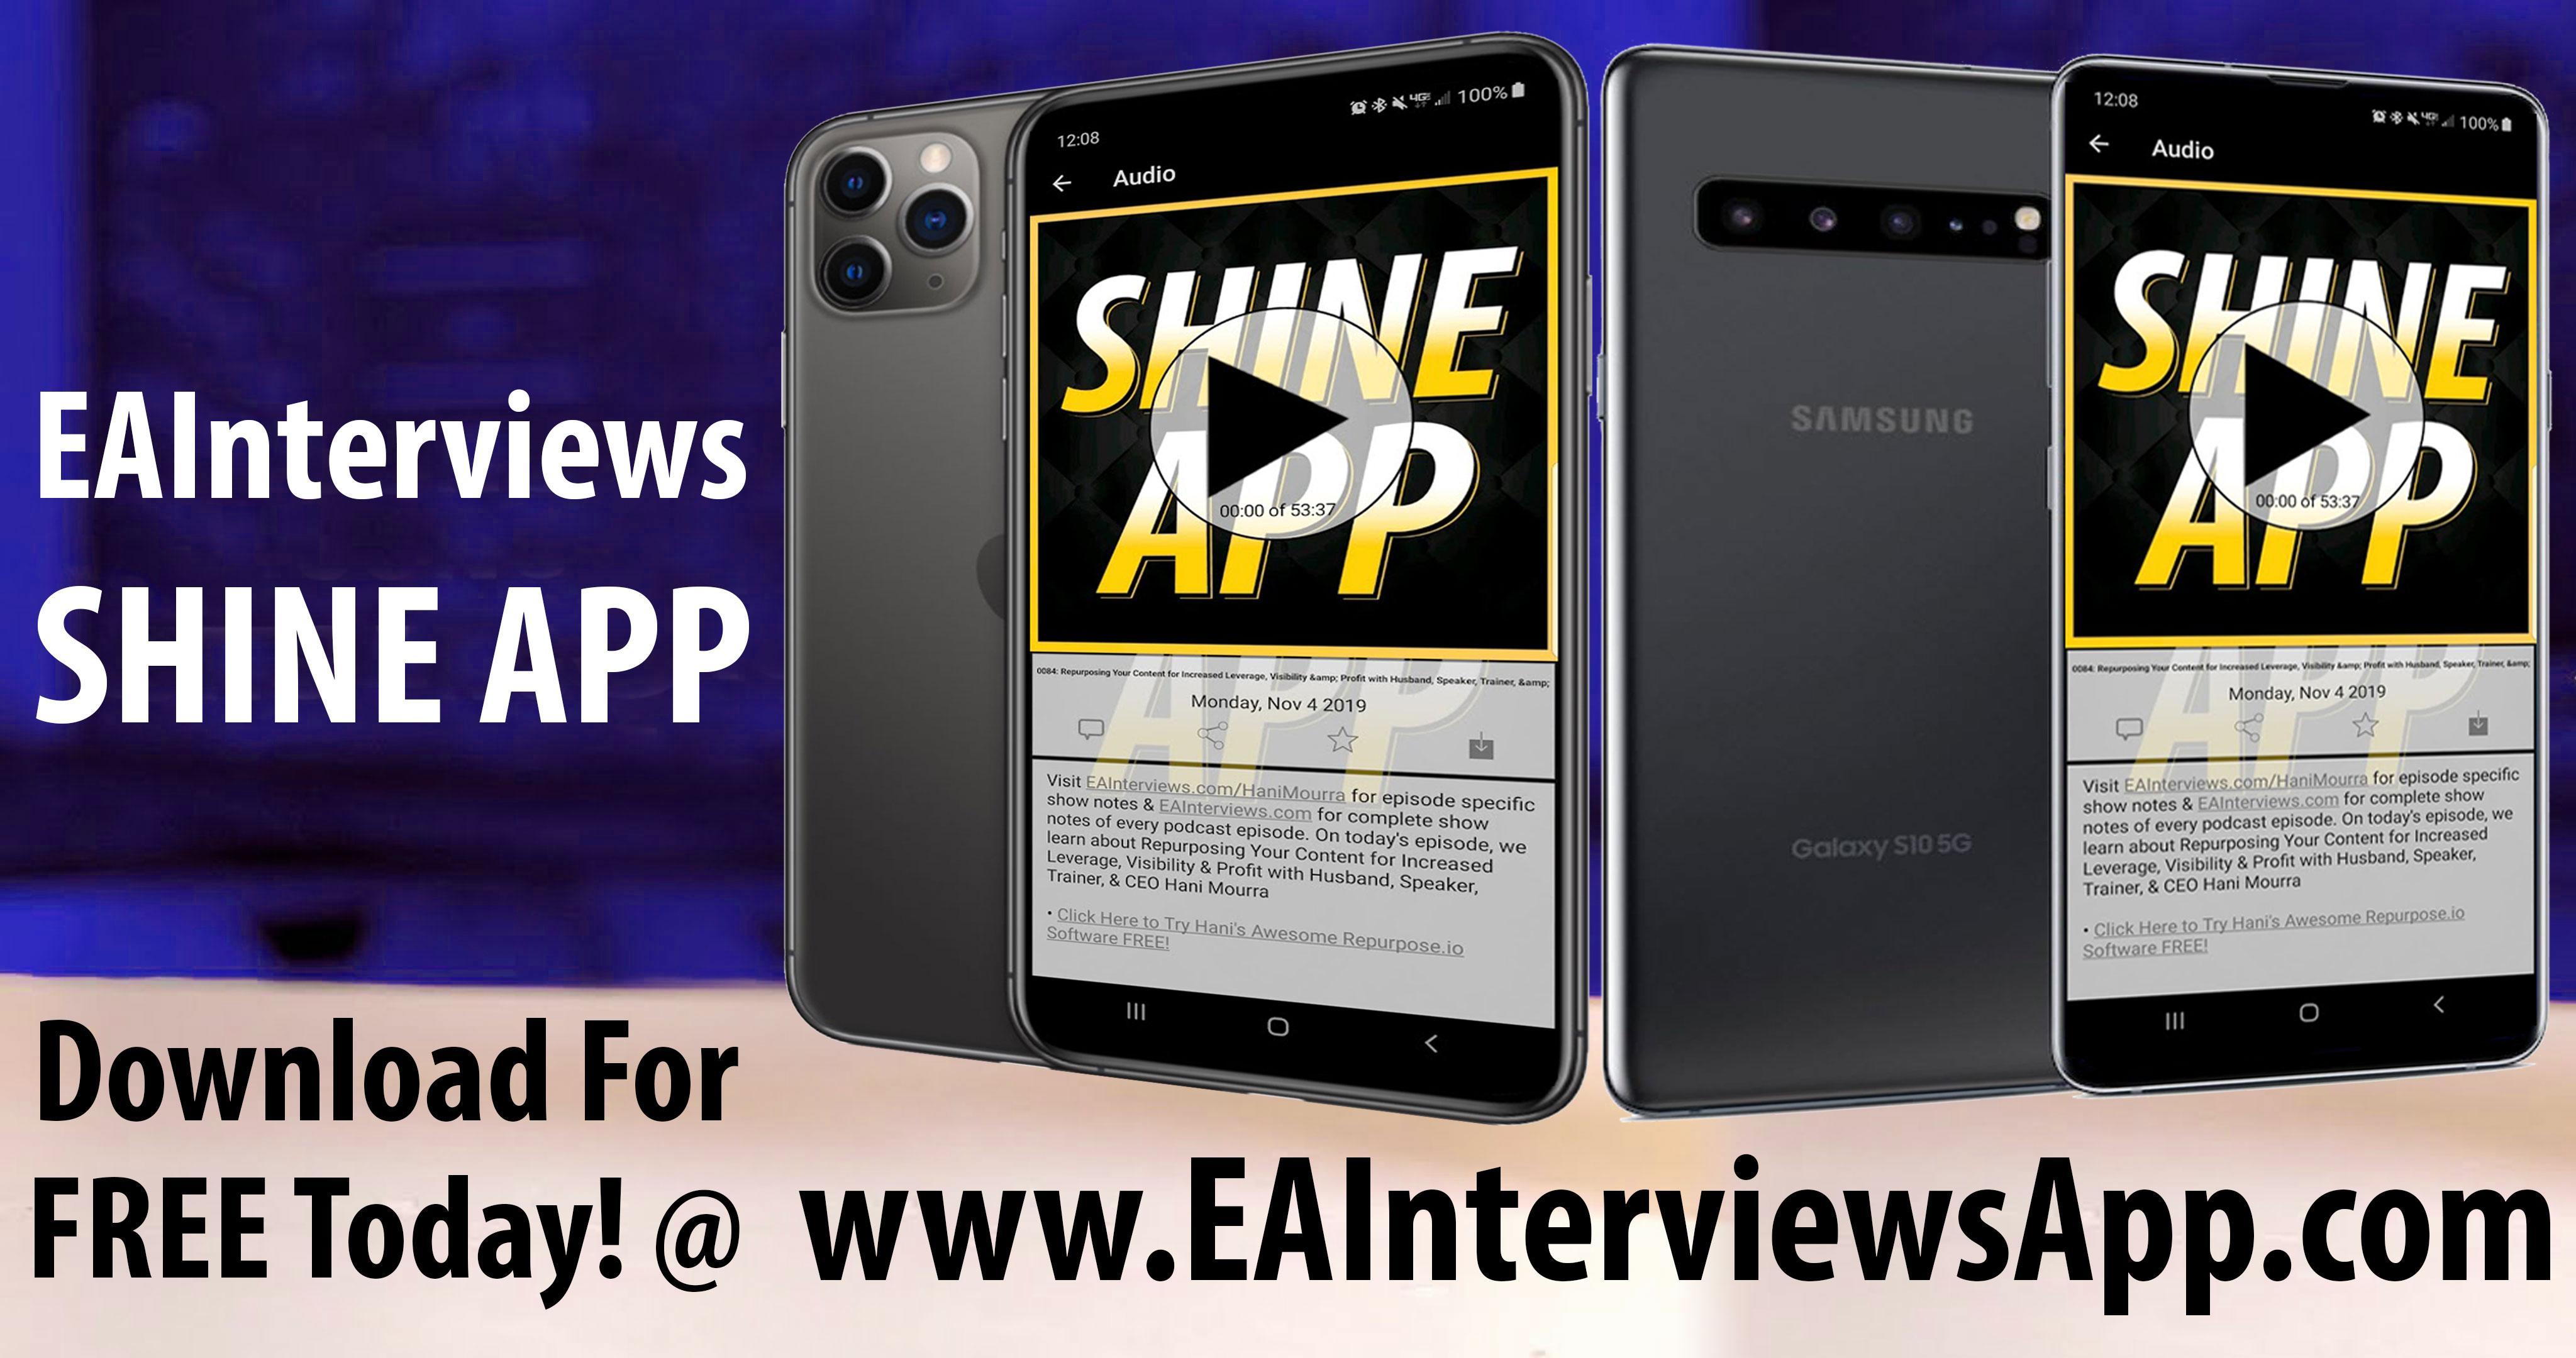 EAInterviews_App_Launch_v2